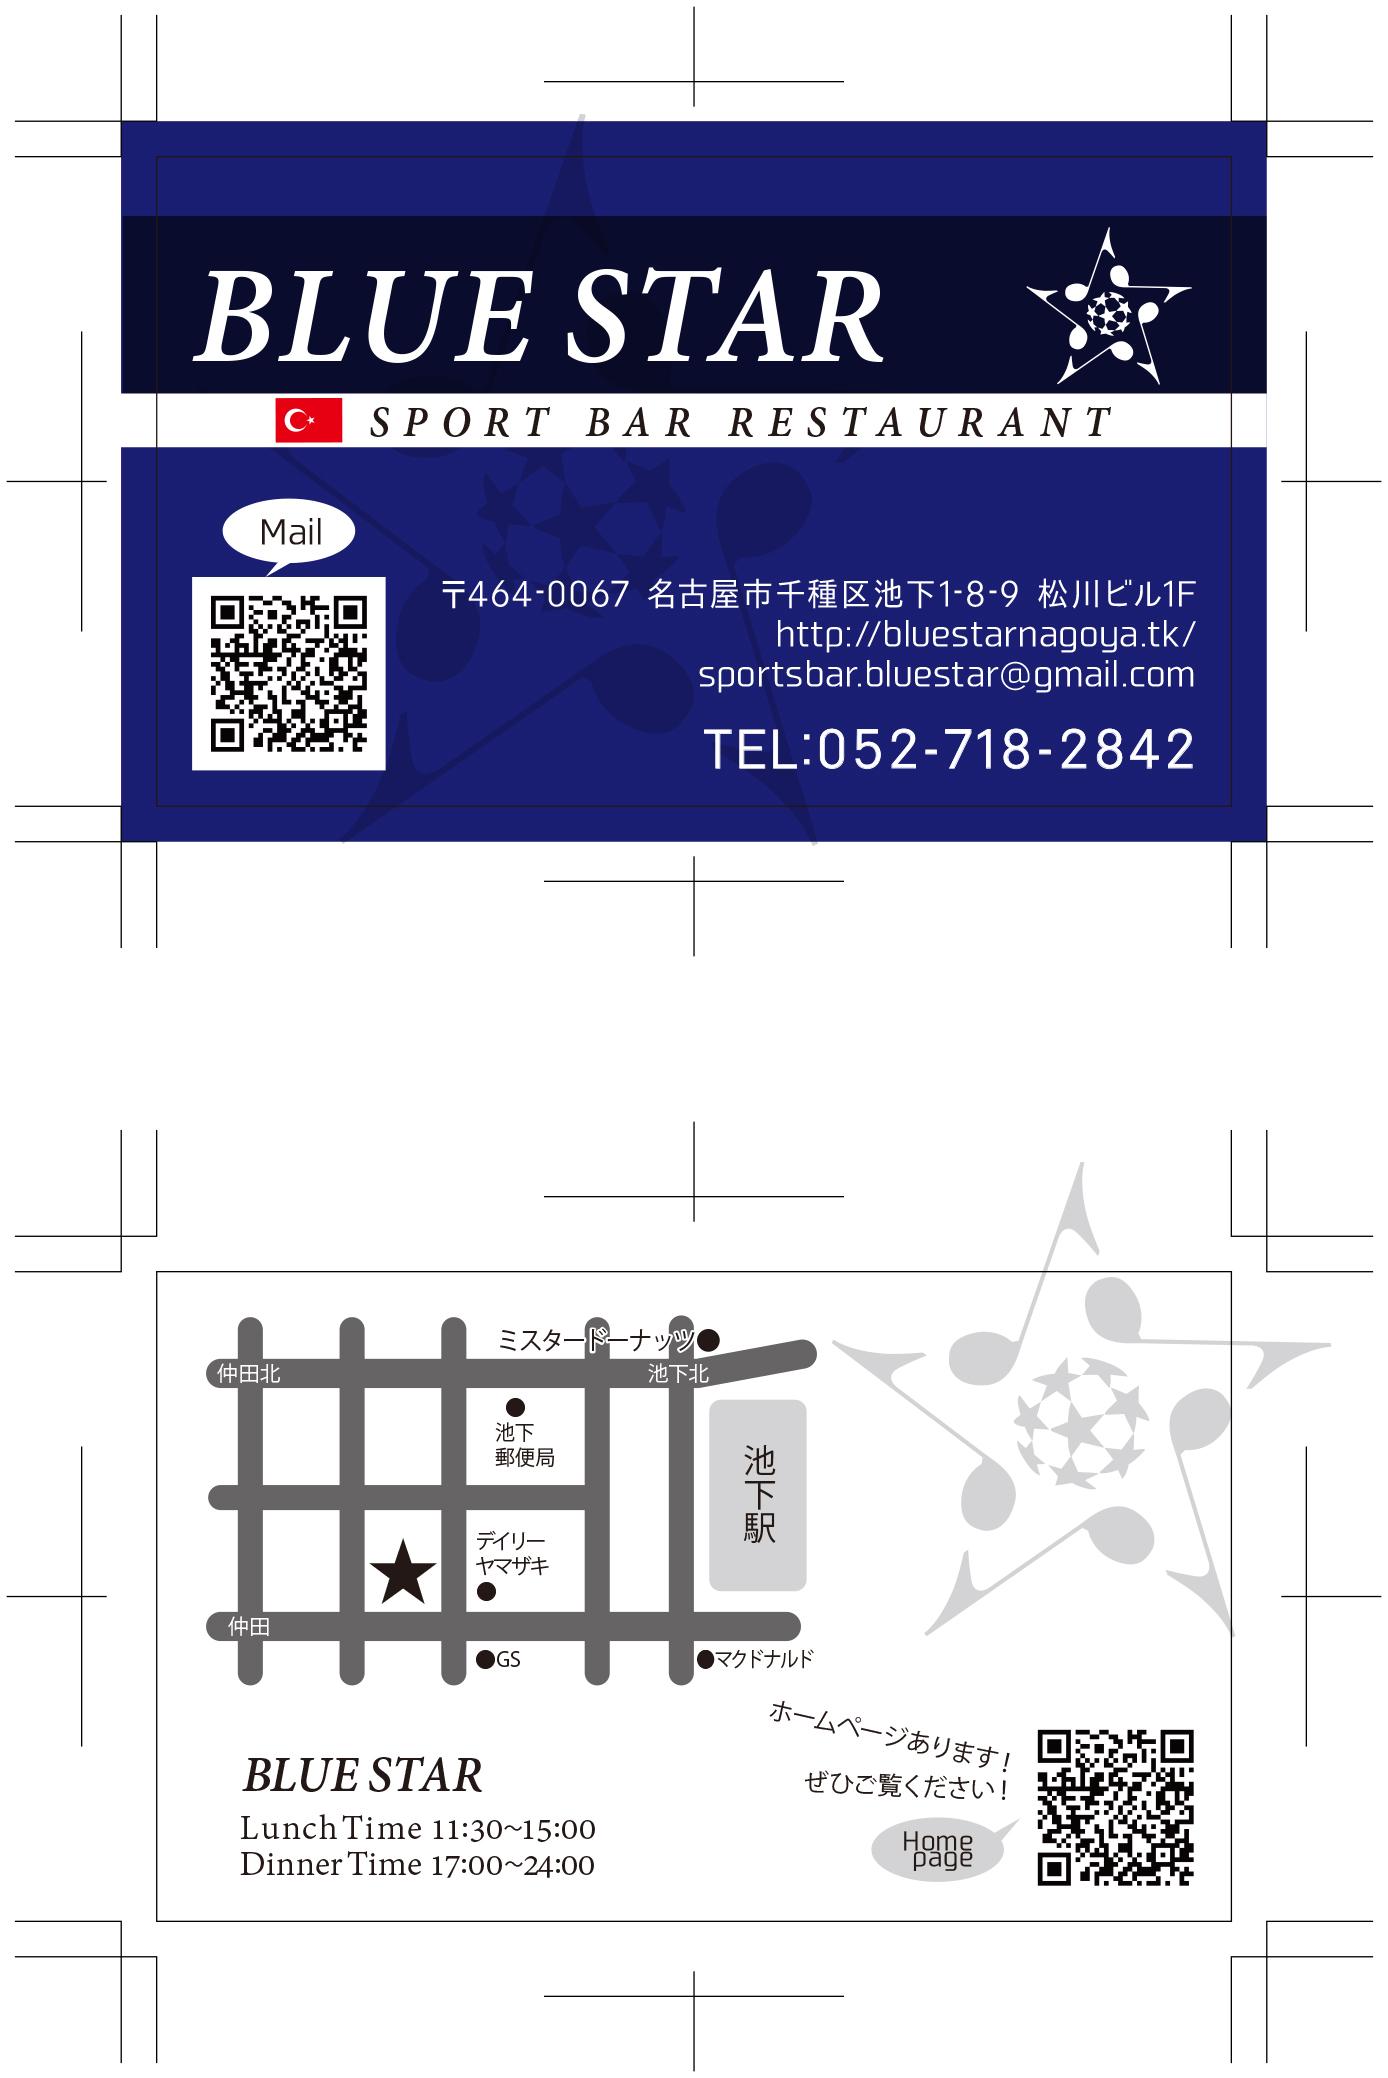 BlueStarショップカード(改)